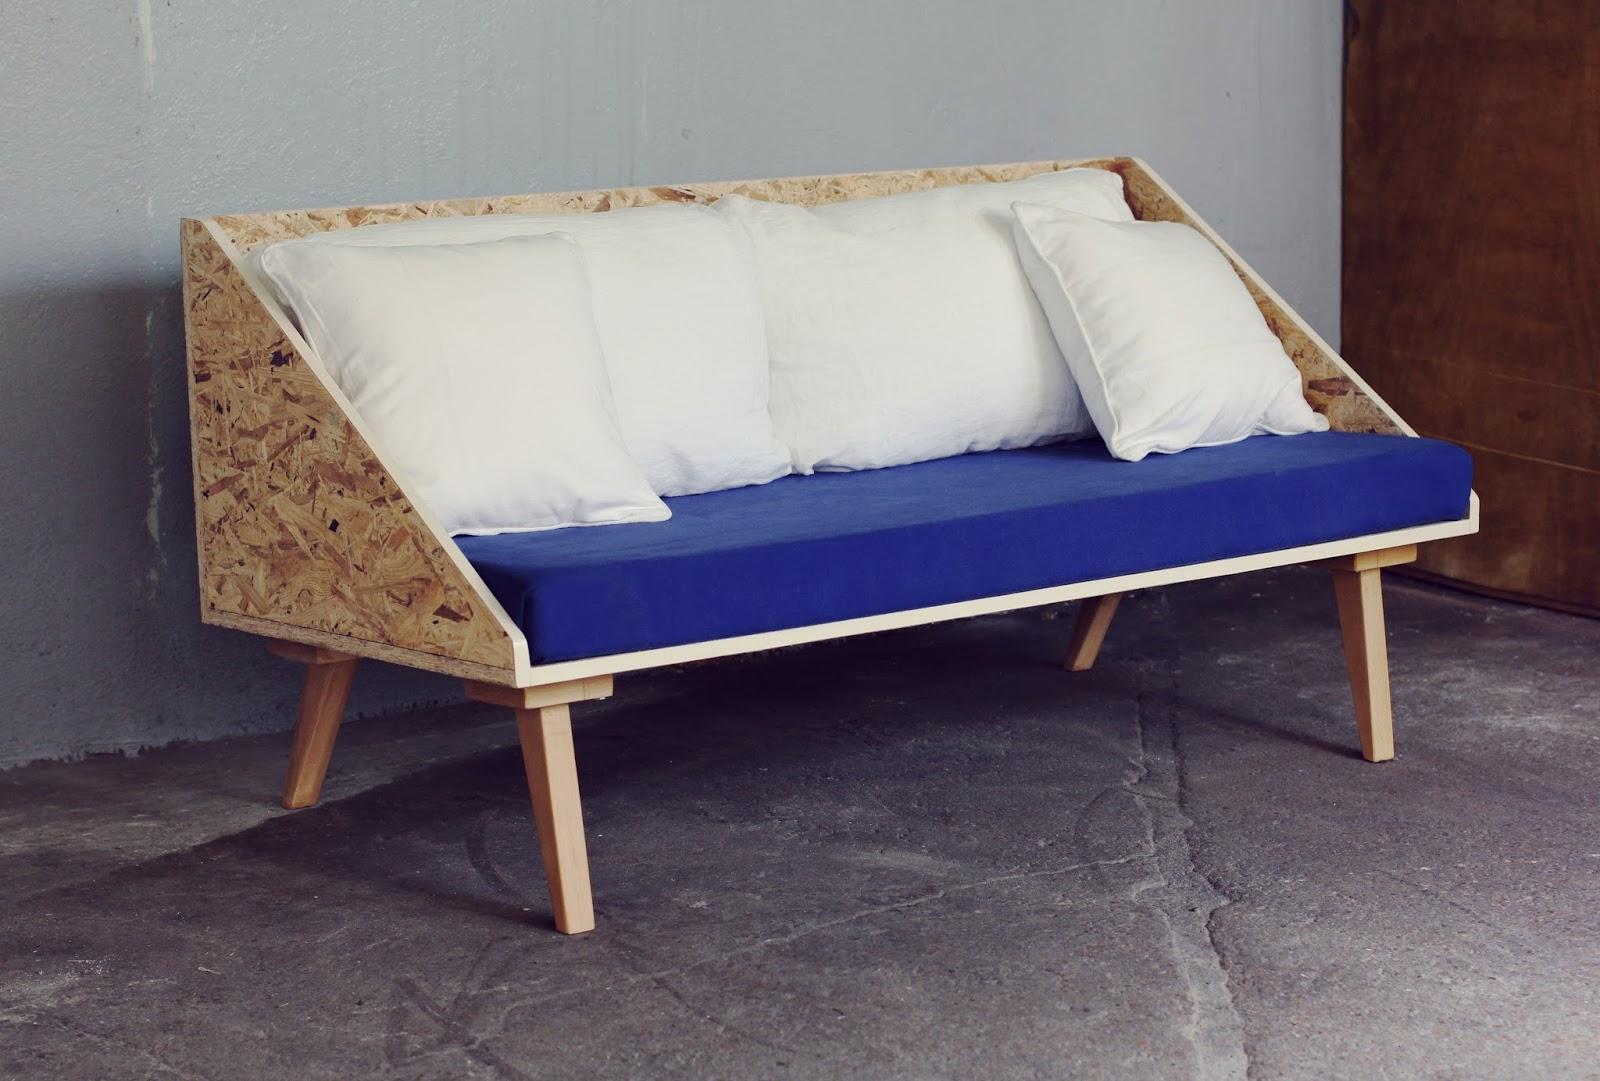 de derri re les fagots le petit canap banquette 600. Black Bedroom Furniture Sets. Home Design Ideas